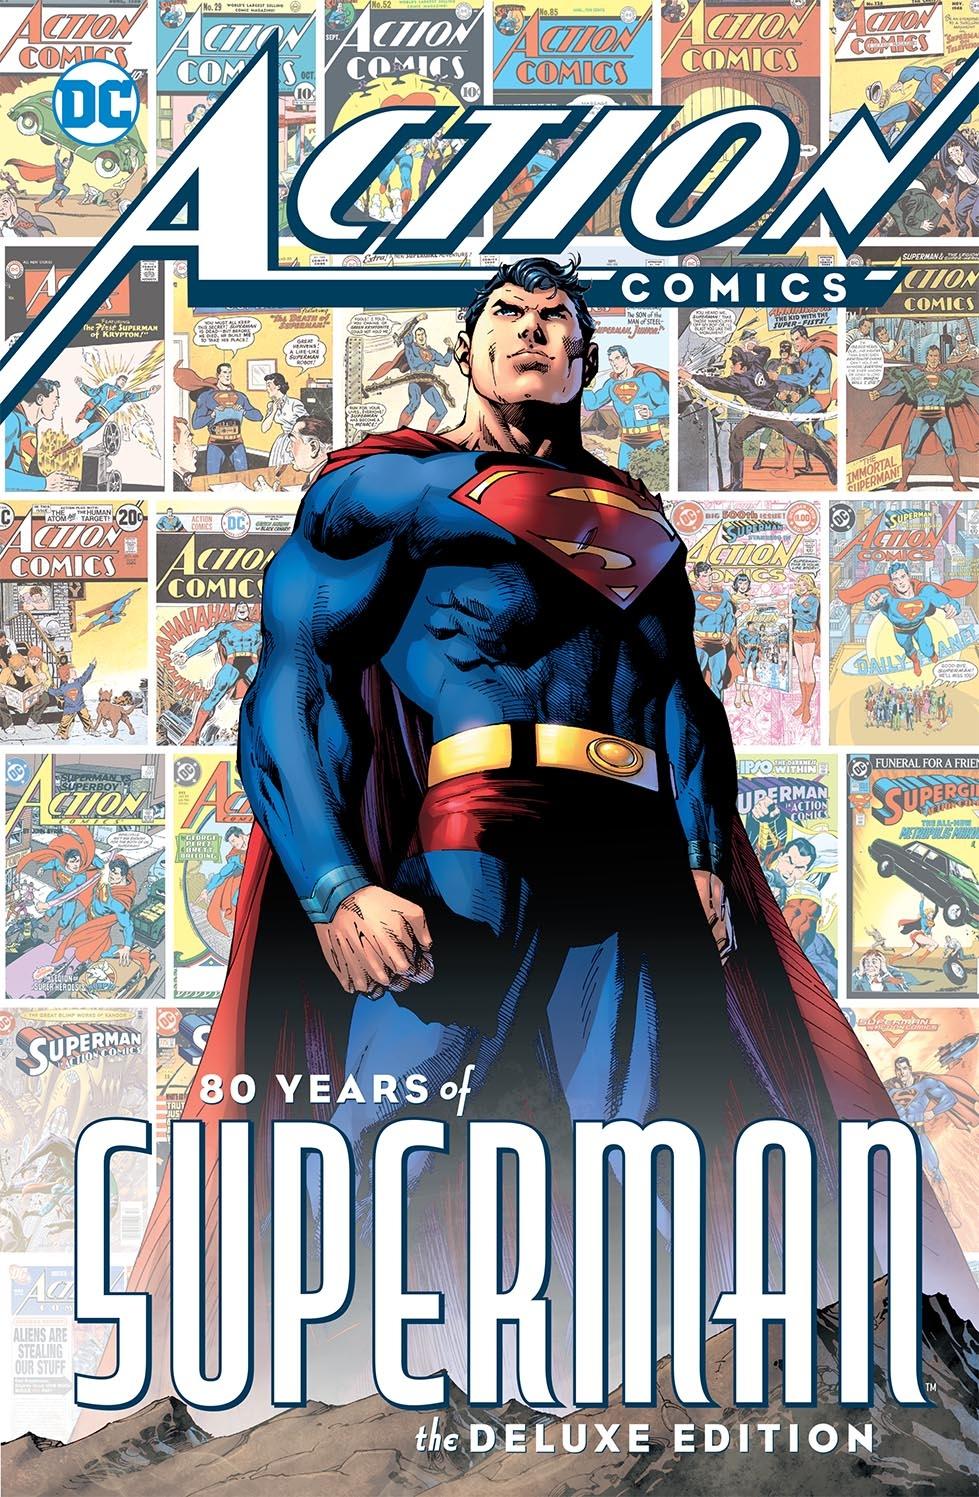 Action Comics 1000 80 years of superman HC (VO)